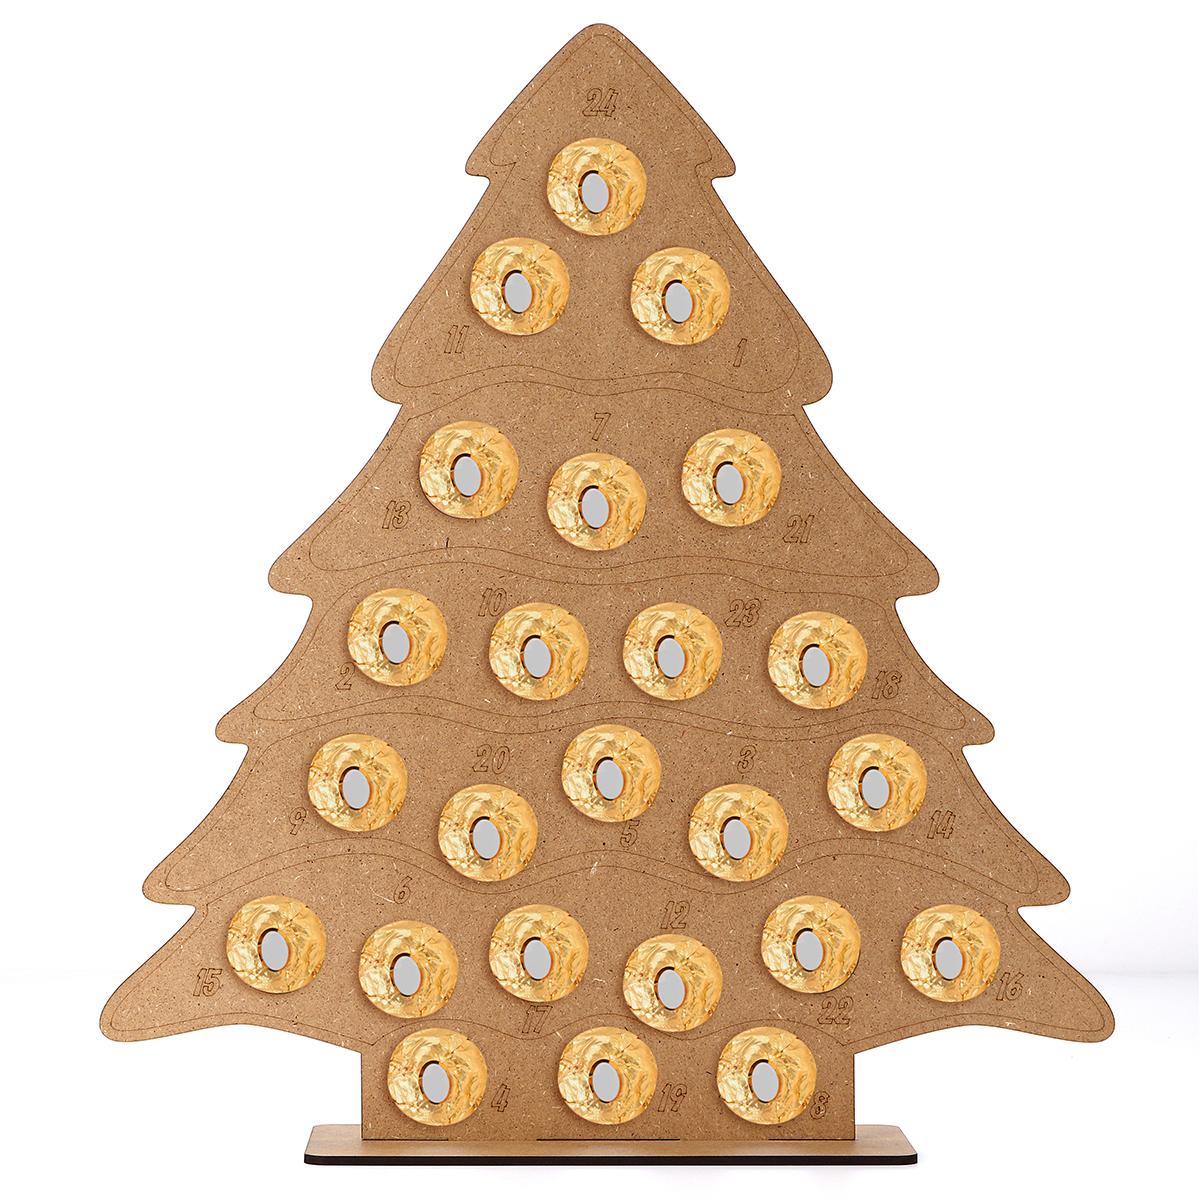 Mdf Wooden Christmas Advent Calendar Christmas Tree Decoration Fits 24 Circular Chocolates Candy Stand Rack Alexnld Com